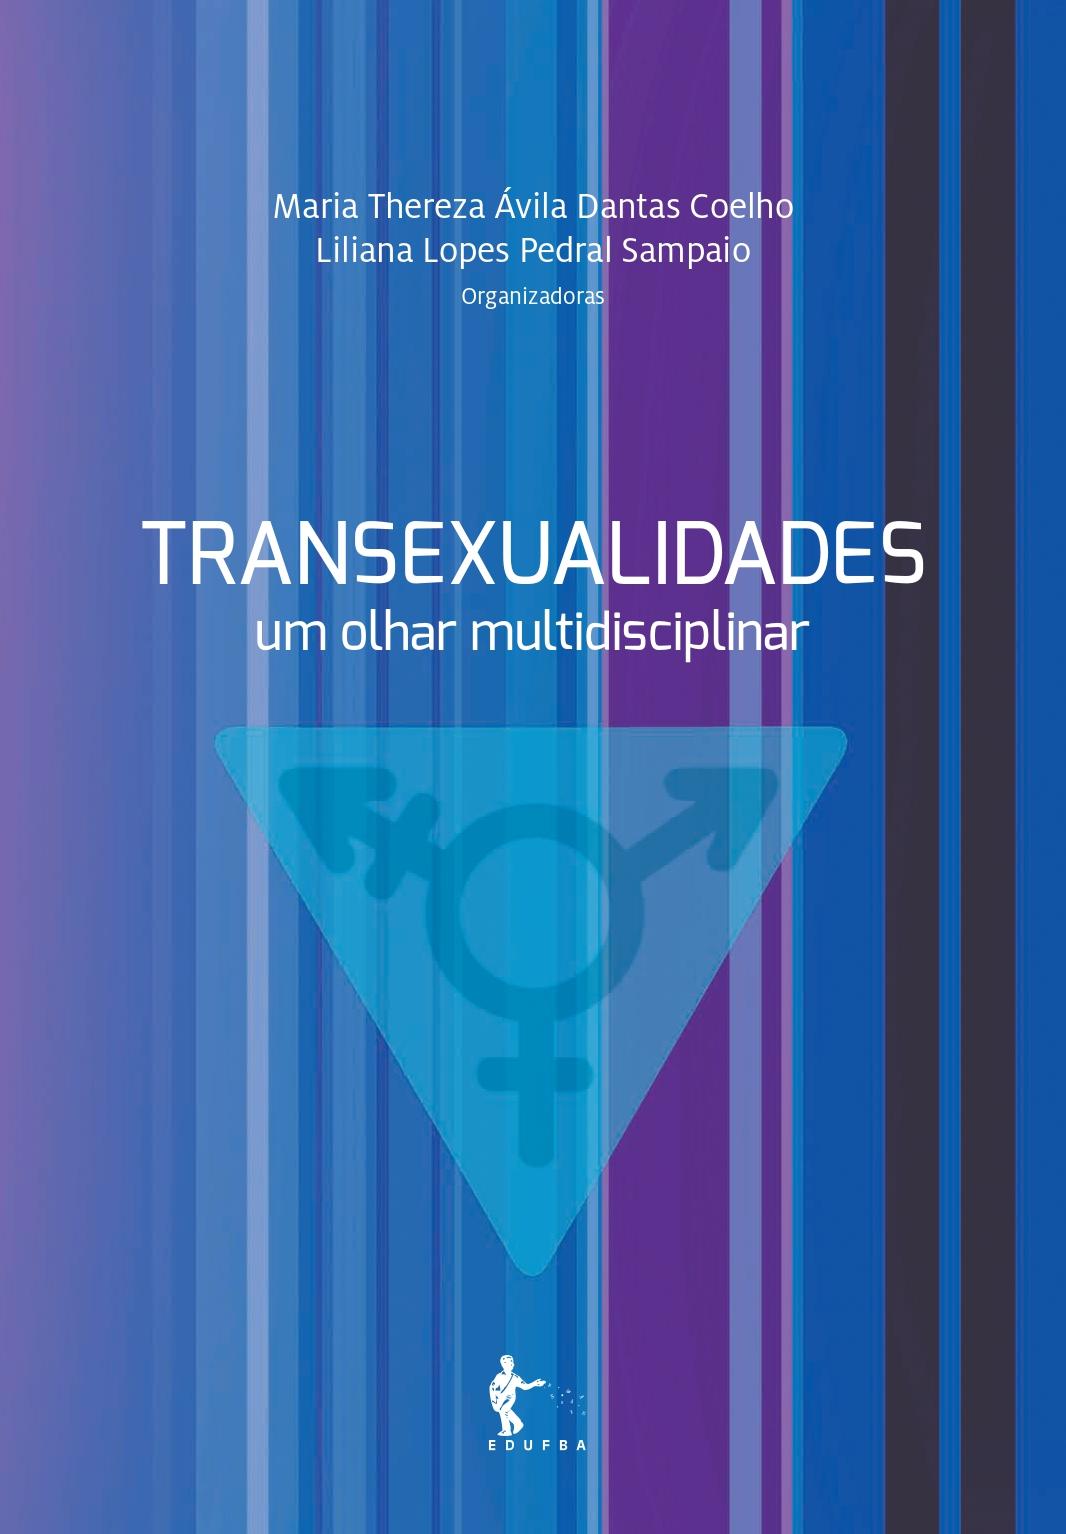 Transexualidades: um olhar multidisciplinar